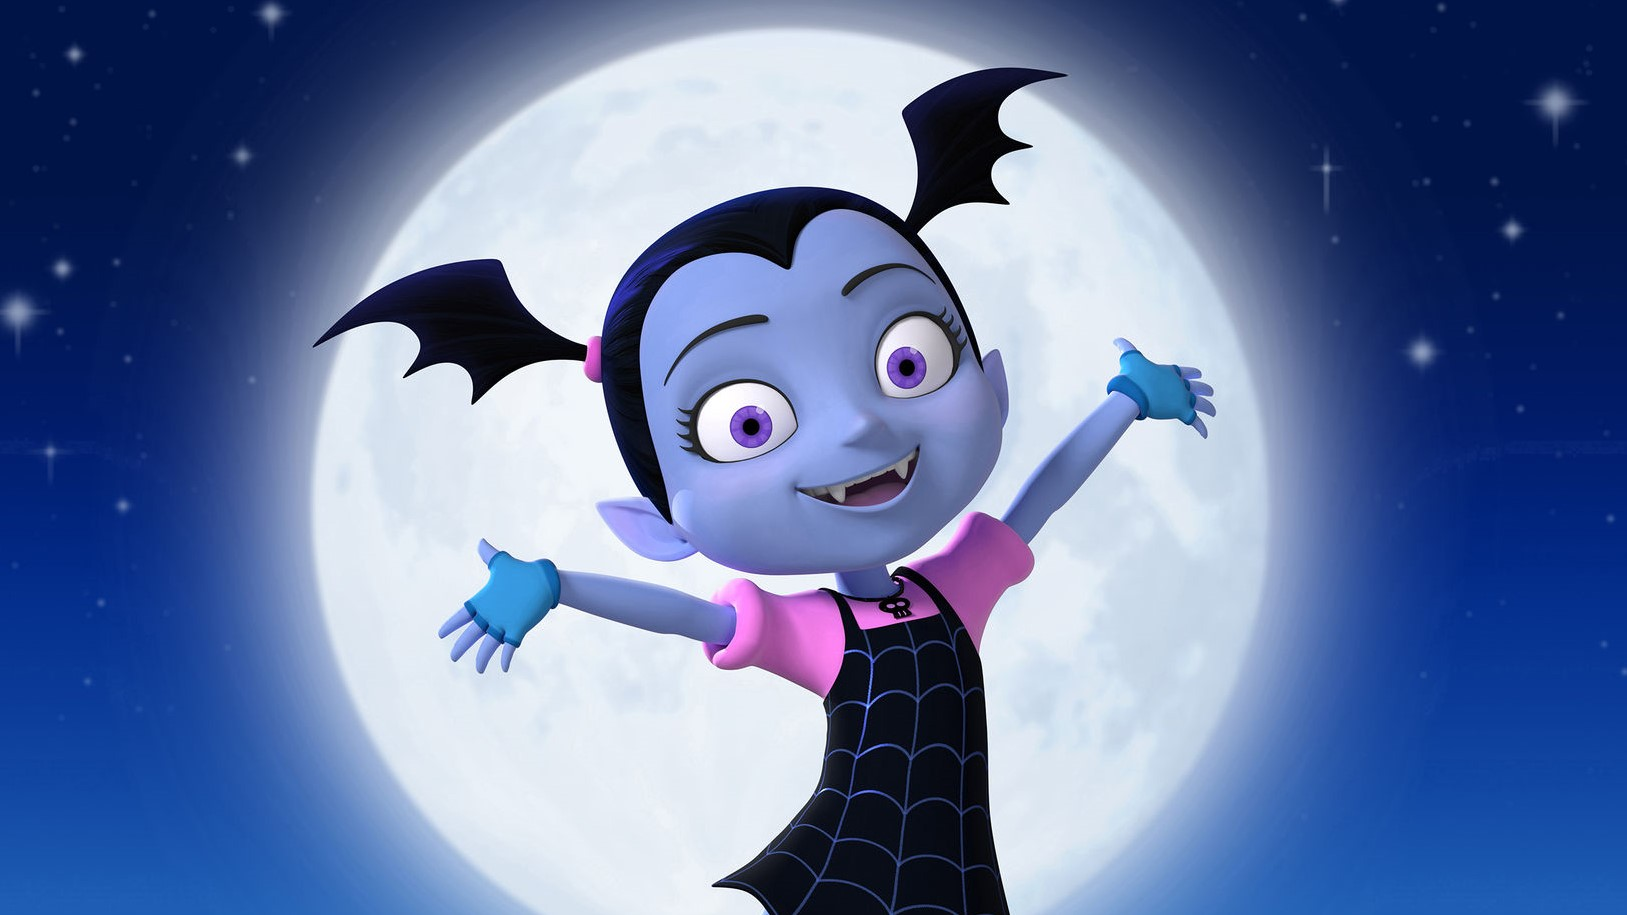 Kids-n-fun.com  10 coloring pages of Vampirina